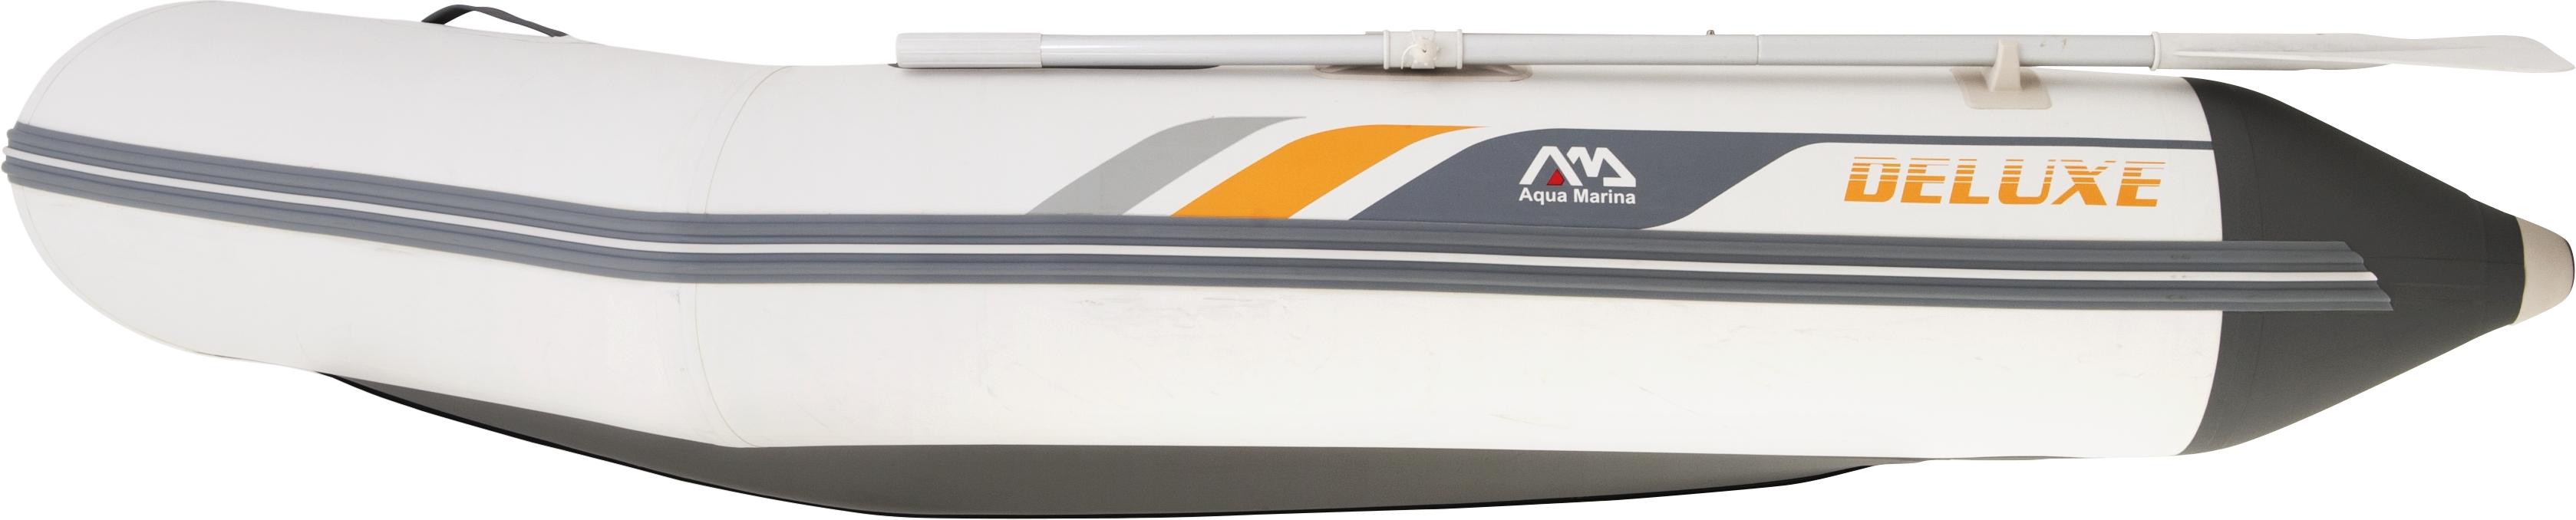 člun Aqua Marina DeLuxe 3,6 Alu